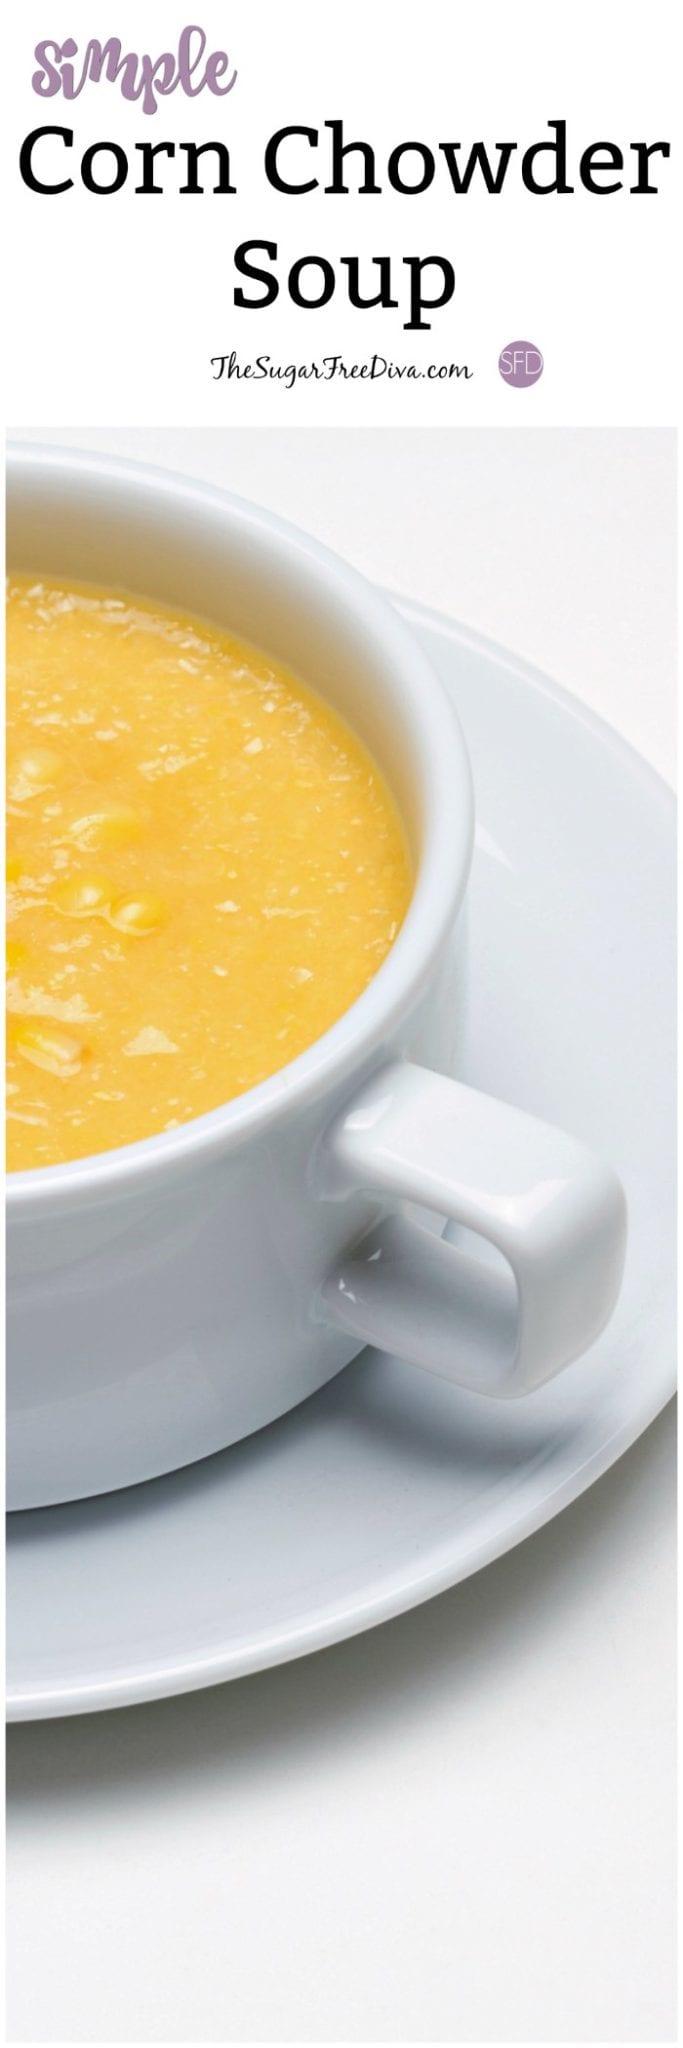 Simple Corn Chowder Soup